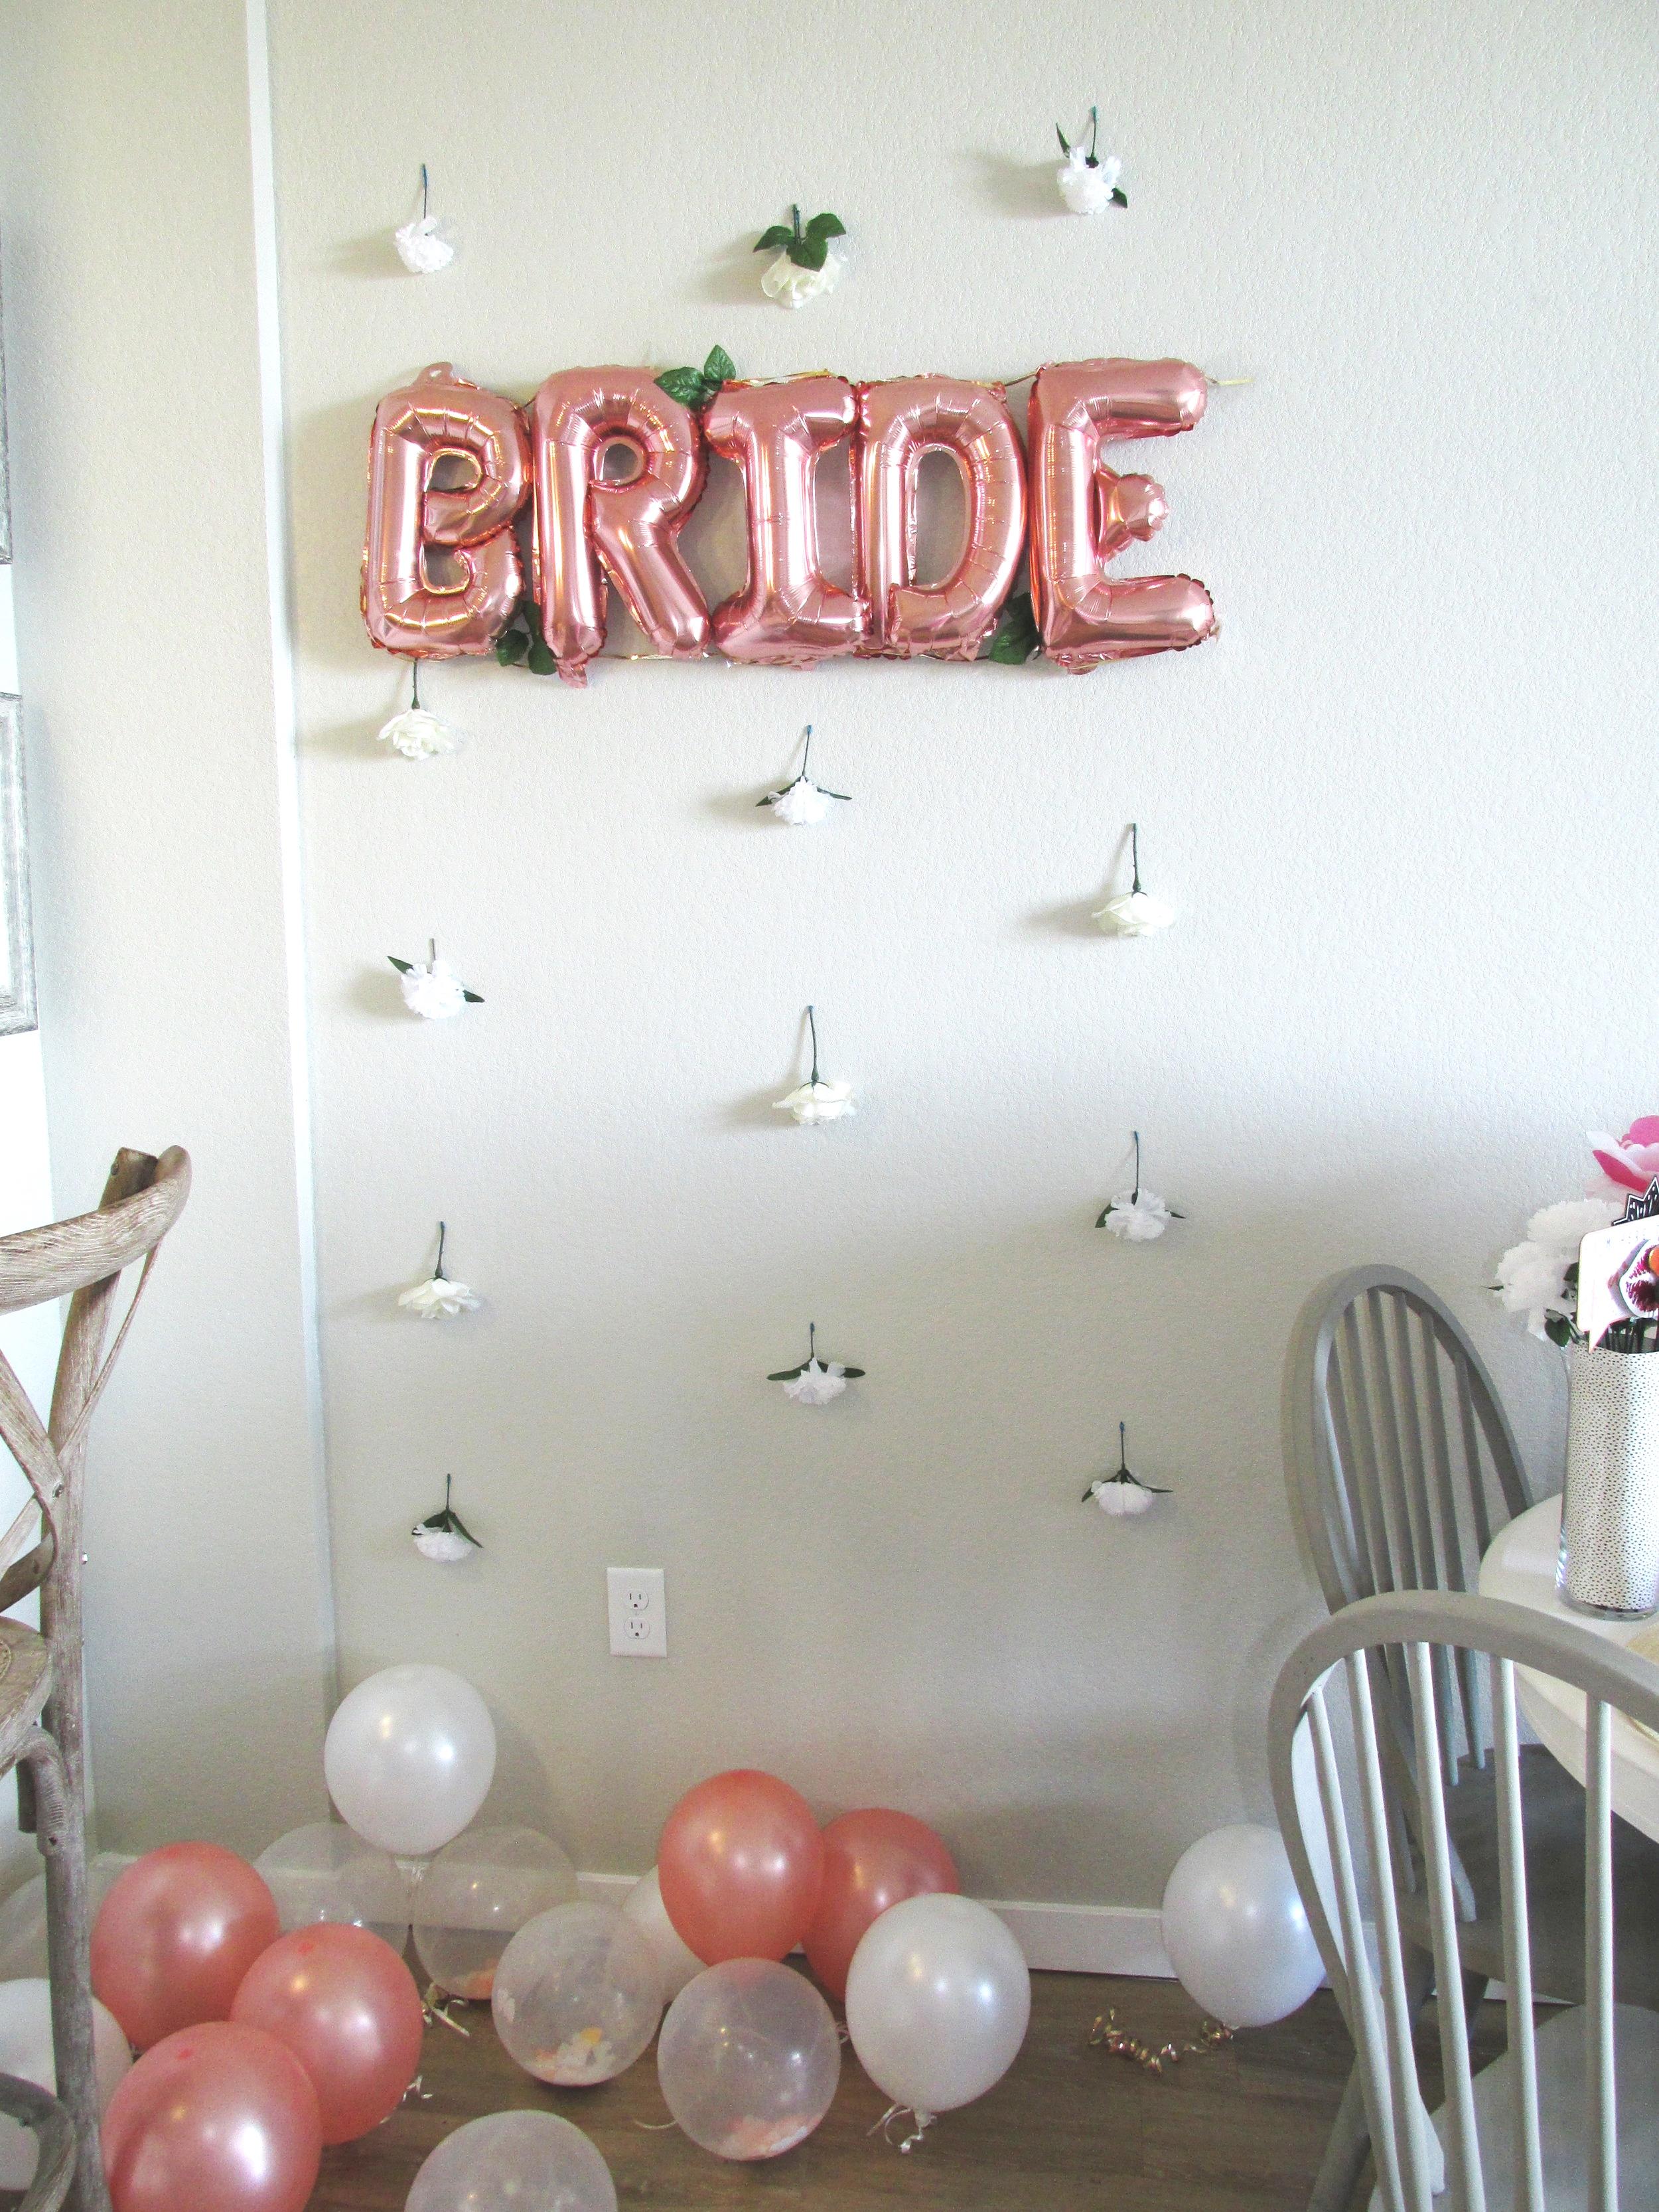 Rose+gold+bride+balloon+bachelorette